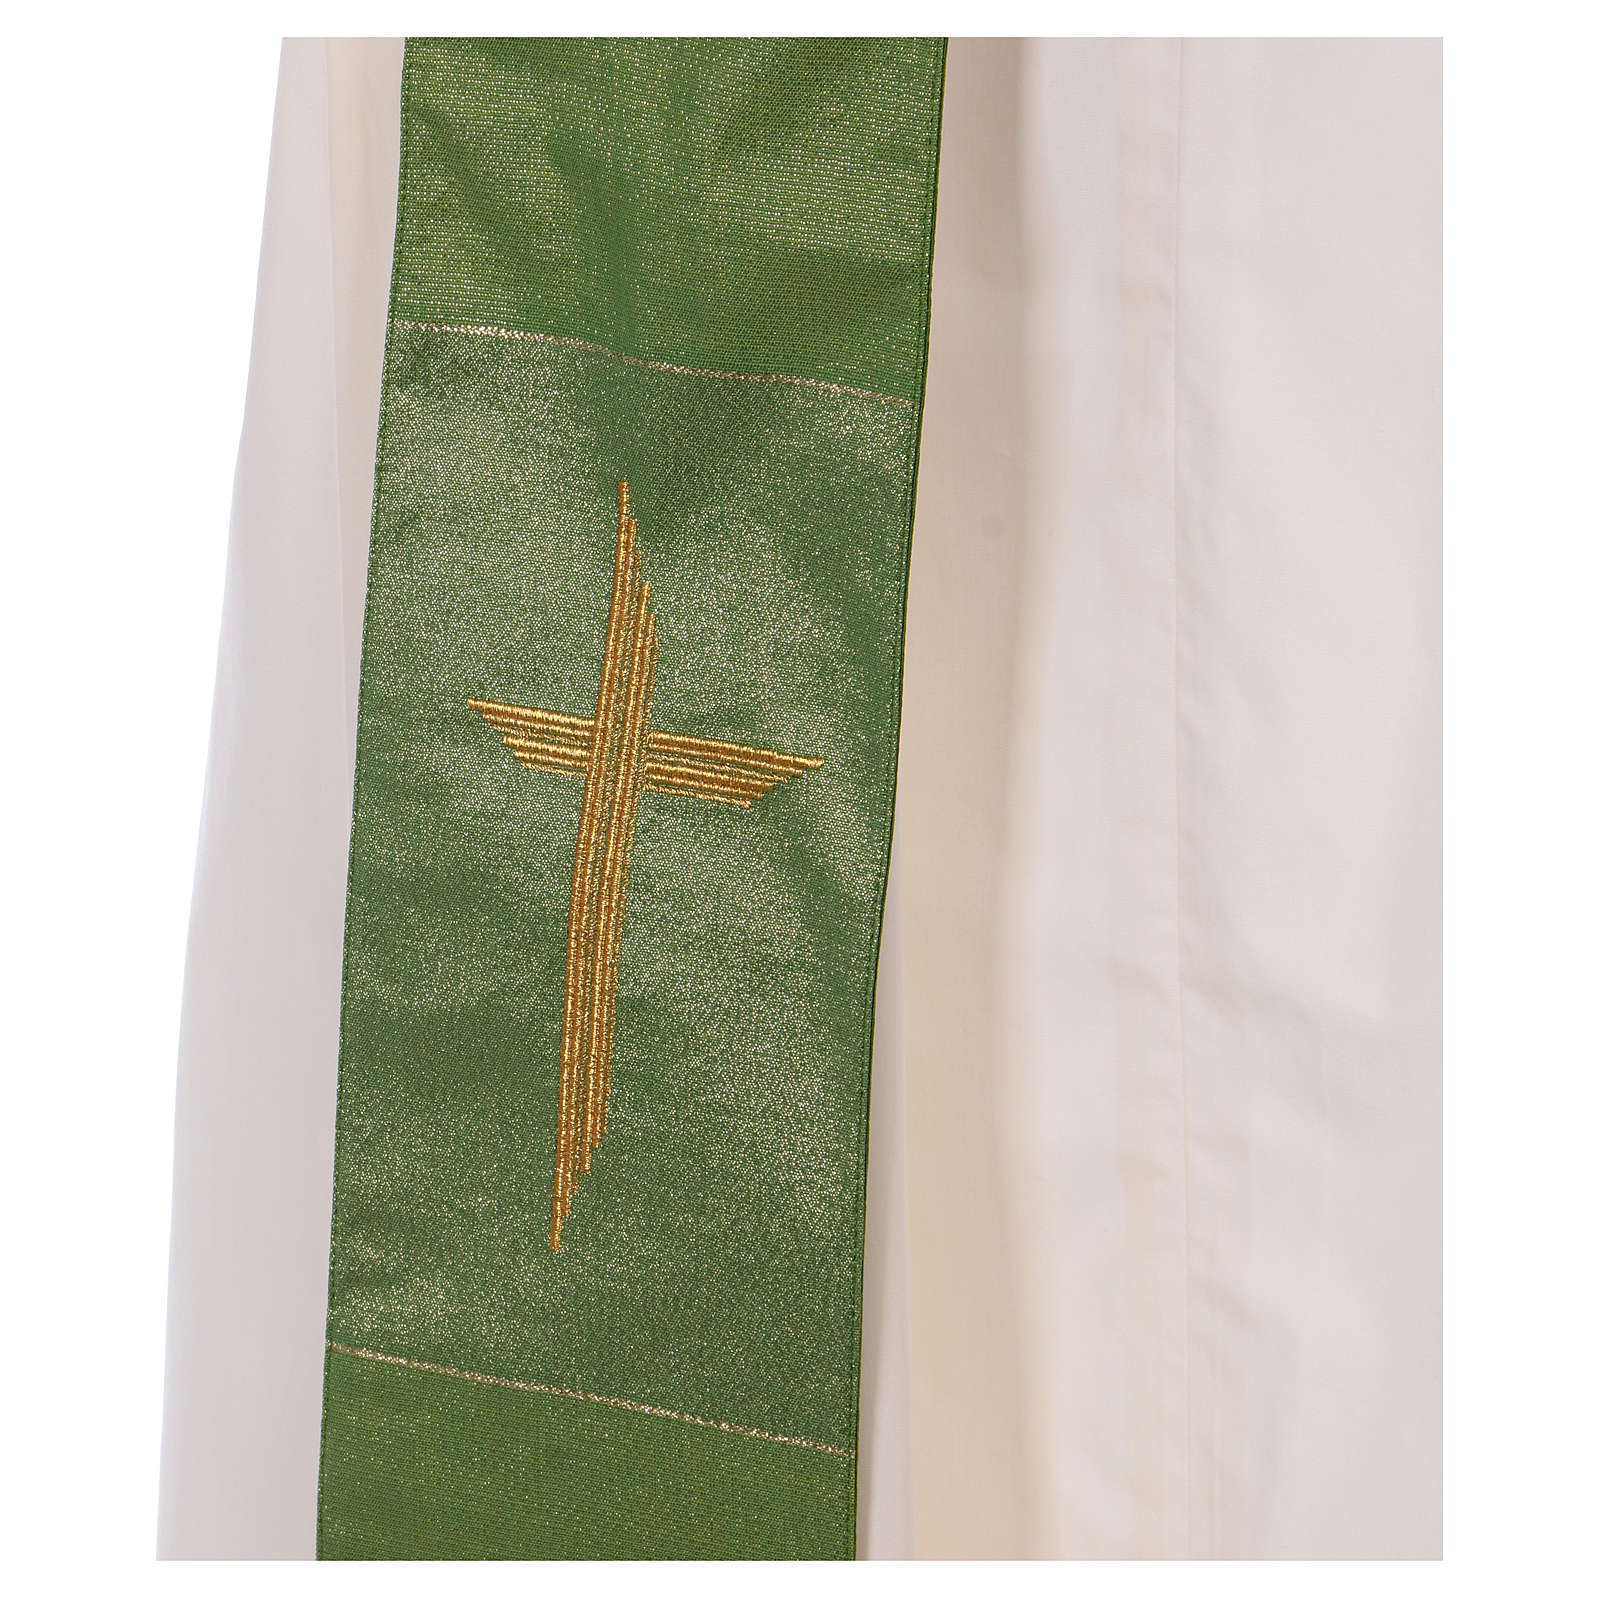 Stola diaconale 85% lana 15% lurex croce dorata 4